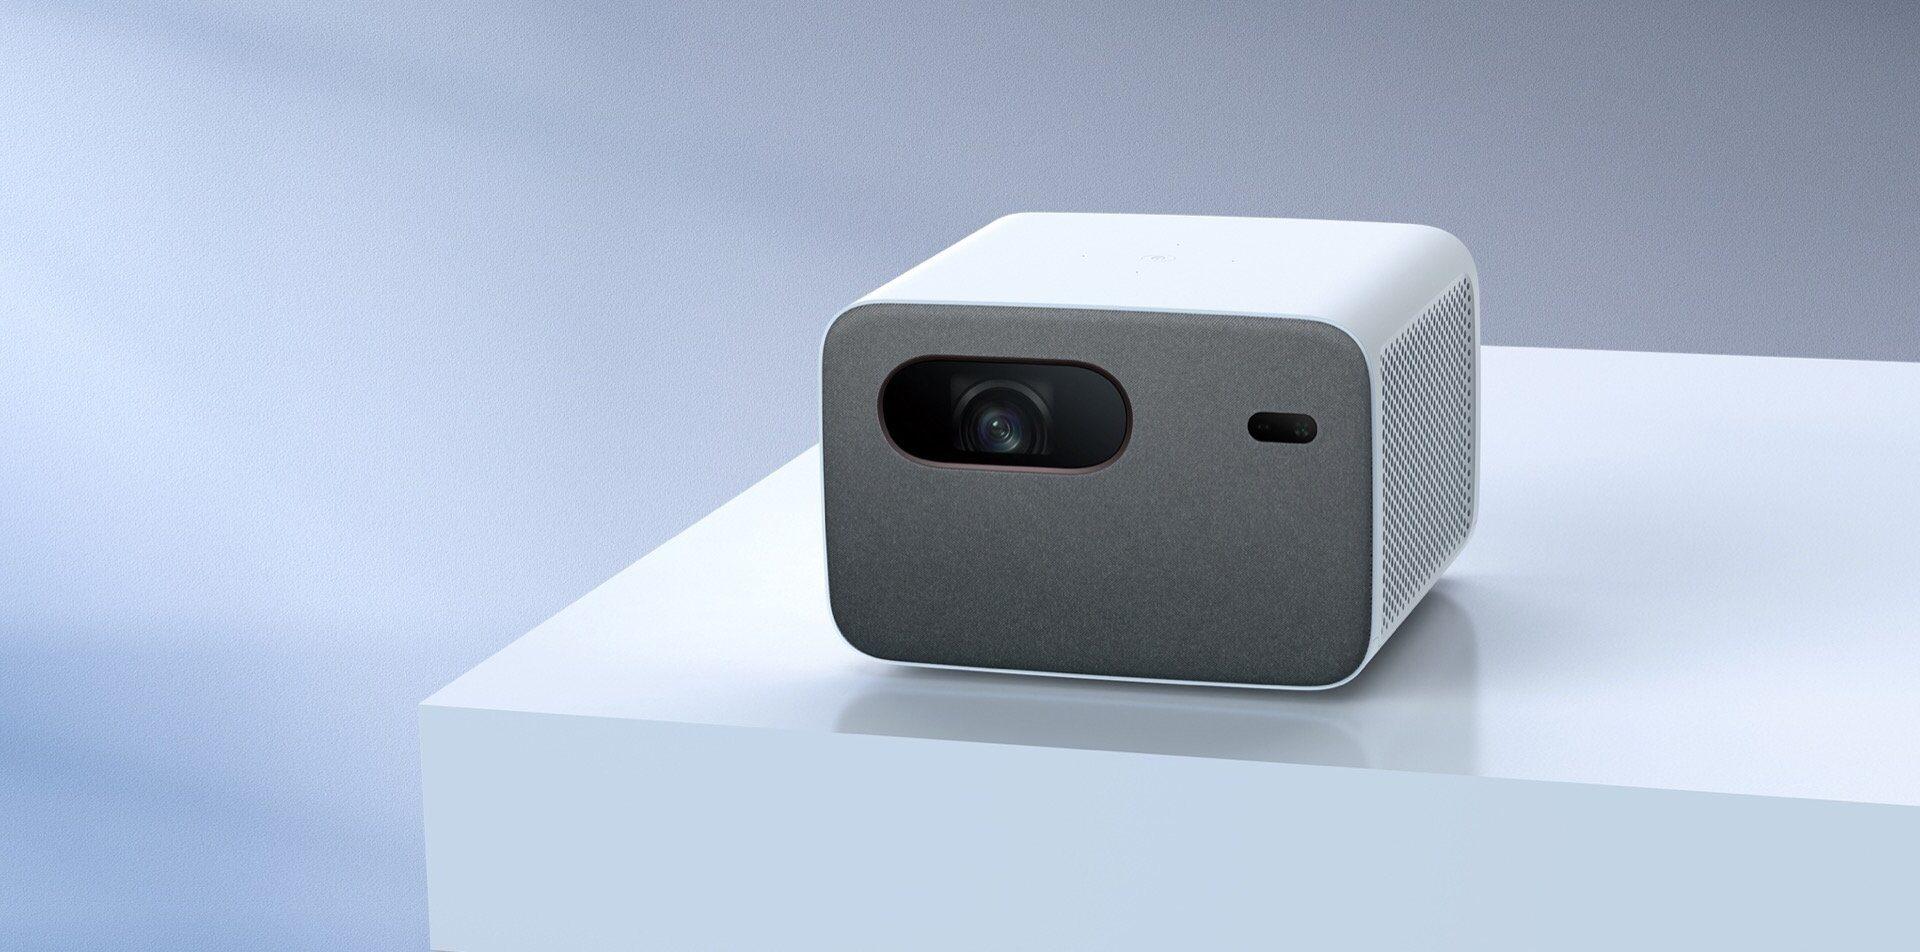 Le projecteur WiFi Xiaomi Mi Smart 2 Pro est à un super prix aujourd'hui ! www.heavybull.com